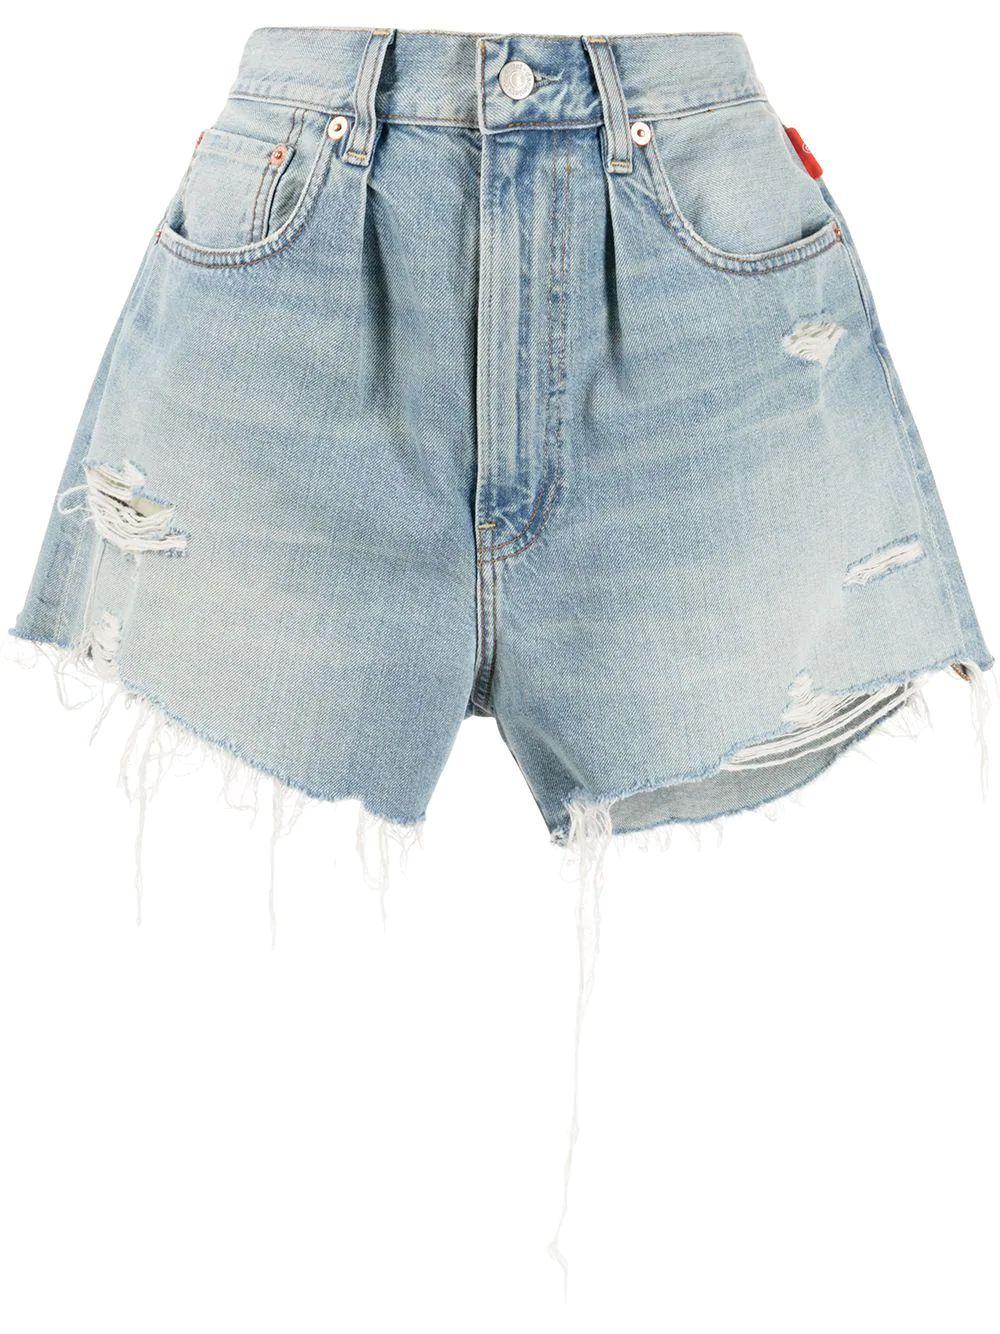 Brooke Cutoff Shorts Item # DSW2105-207